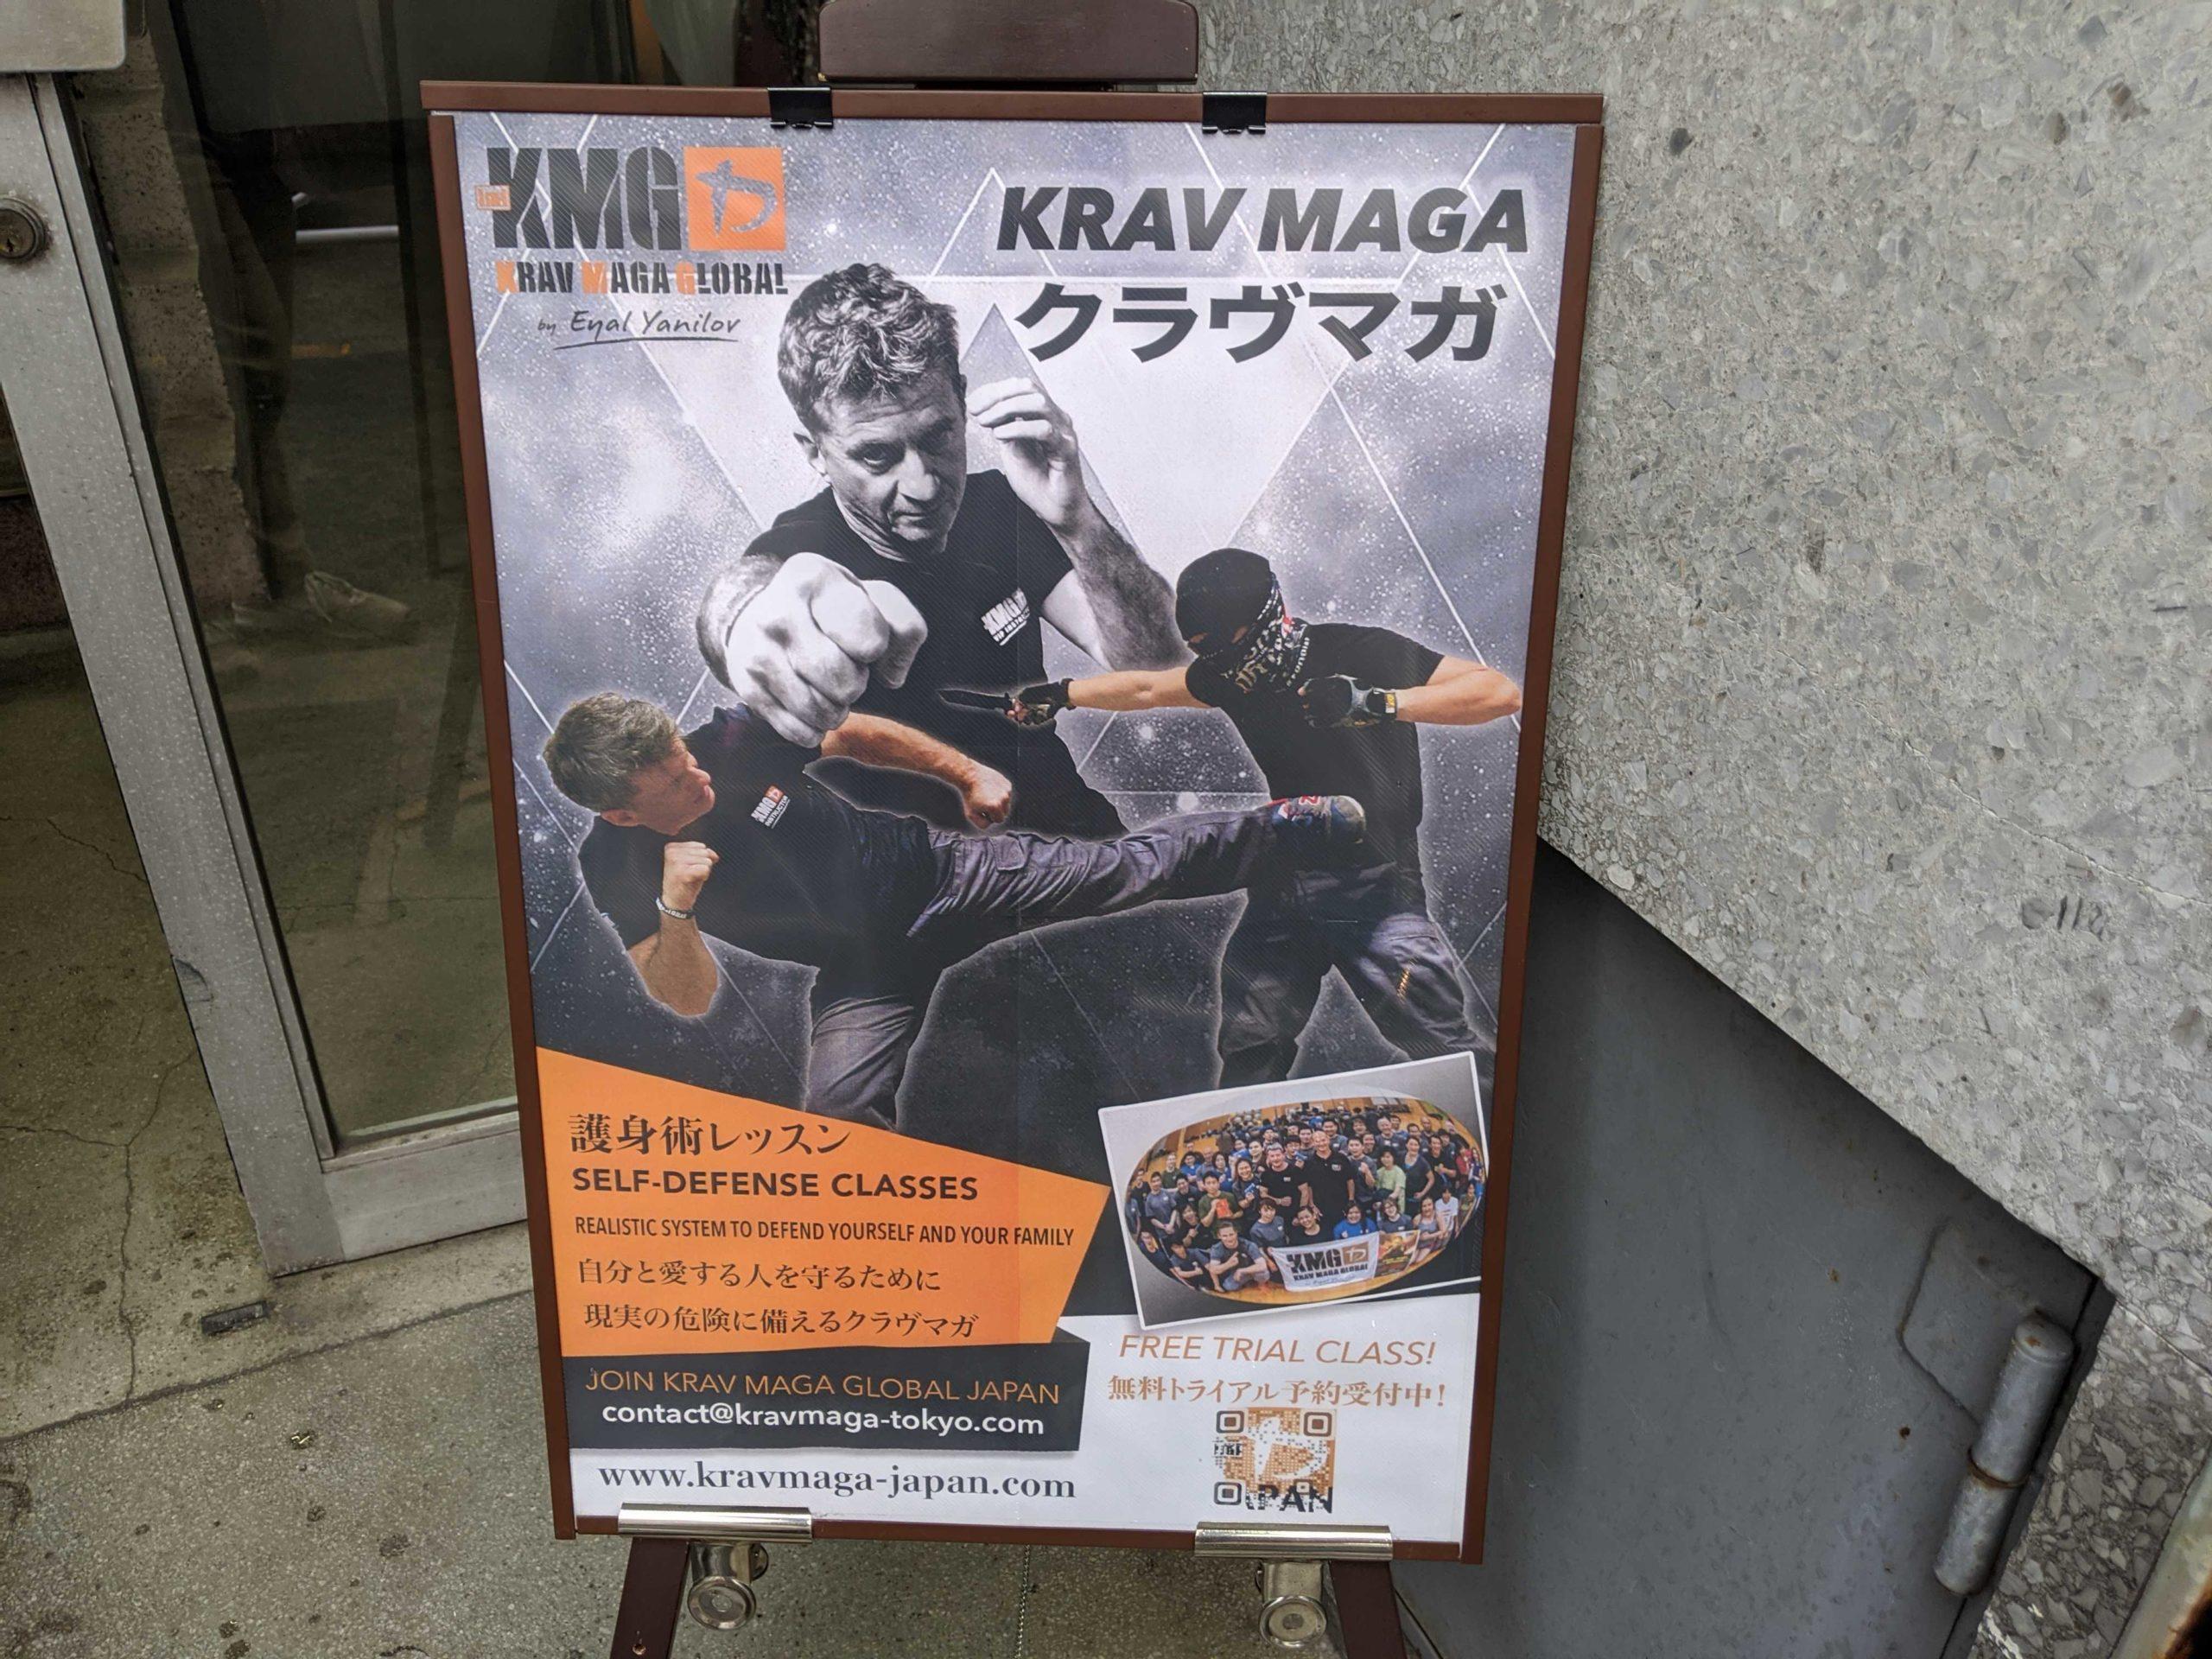 【KMG JAPAN】中目黒でイスラエル発の格闘技クラブマガを体験しよう!|ナカメディア